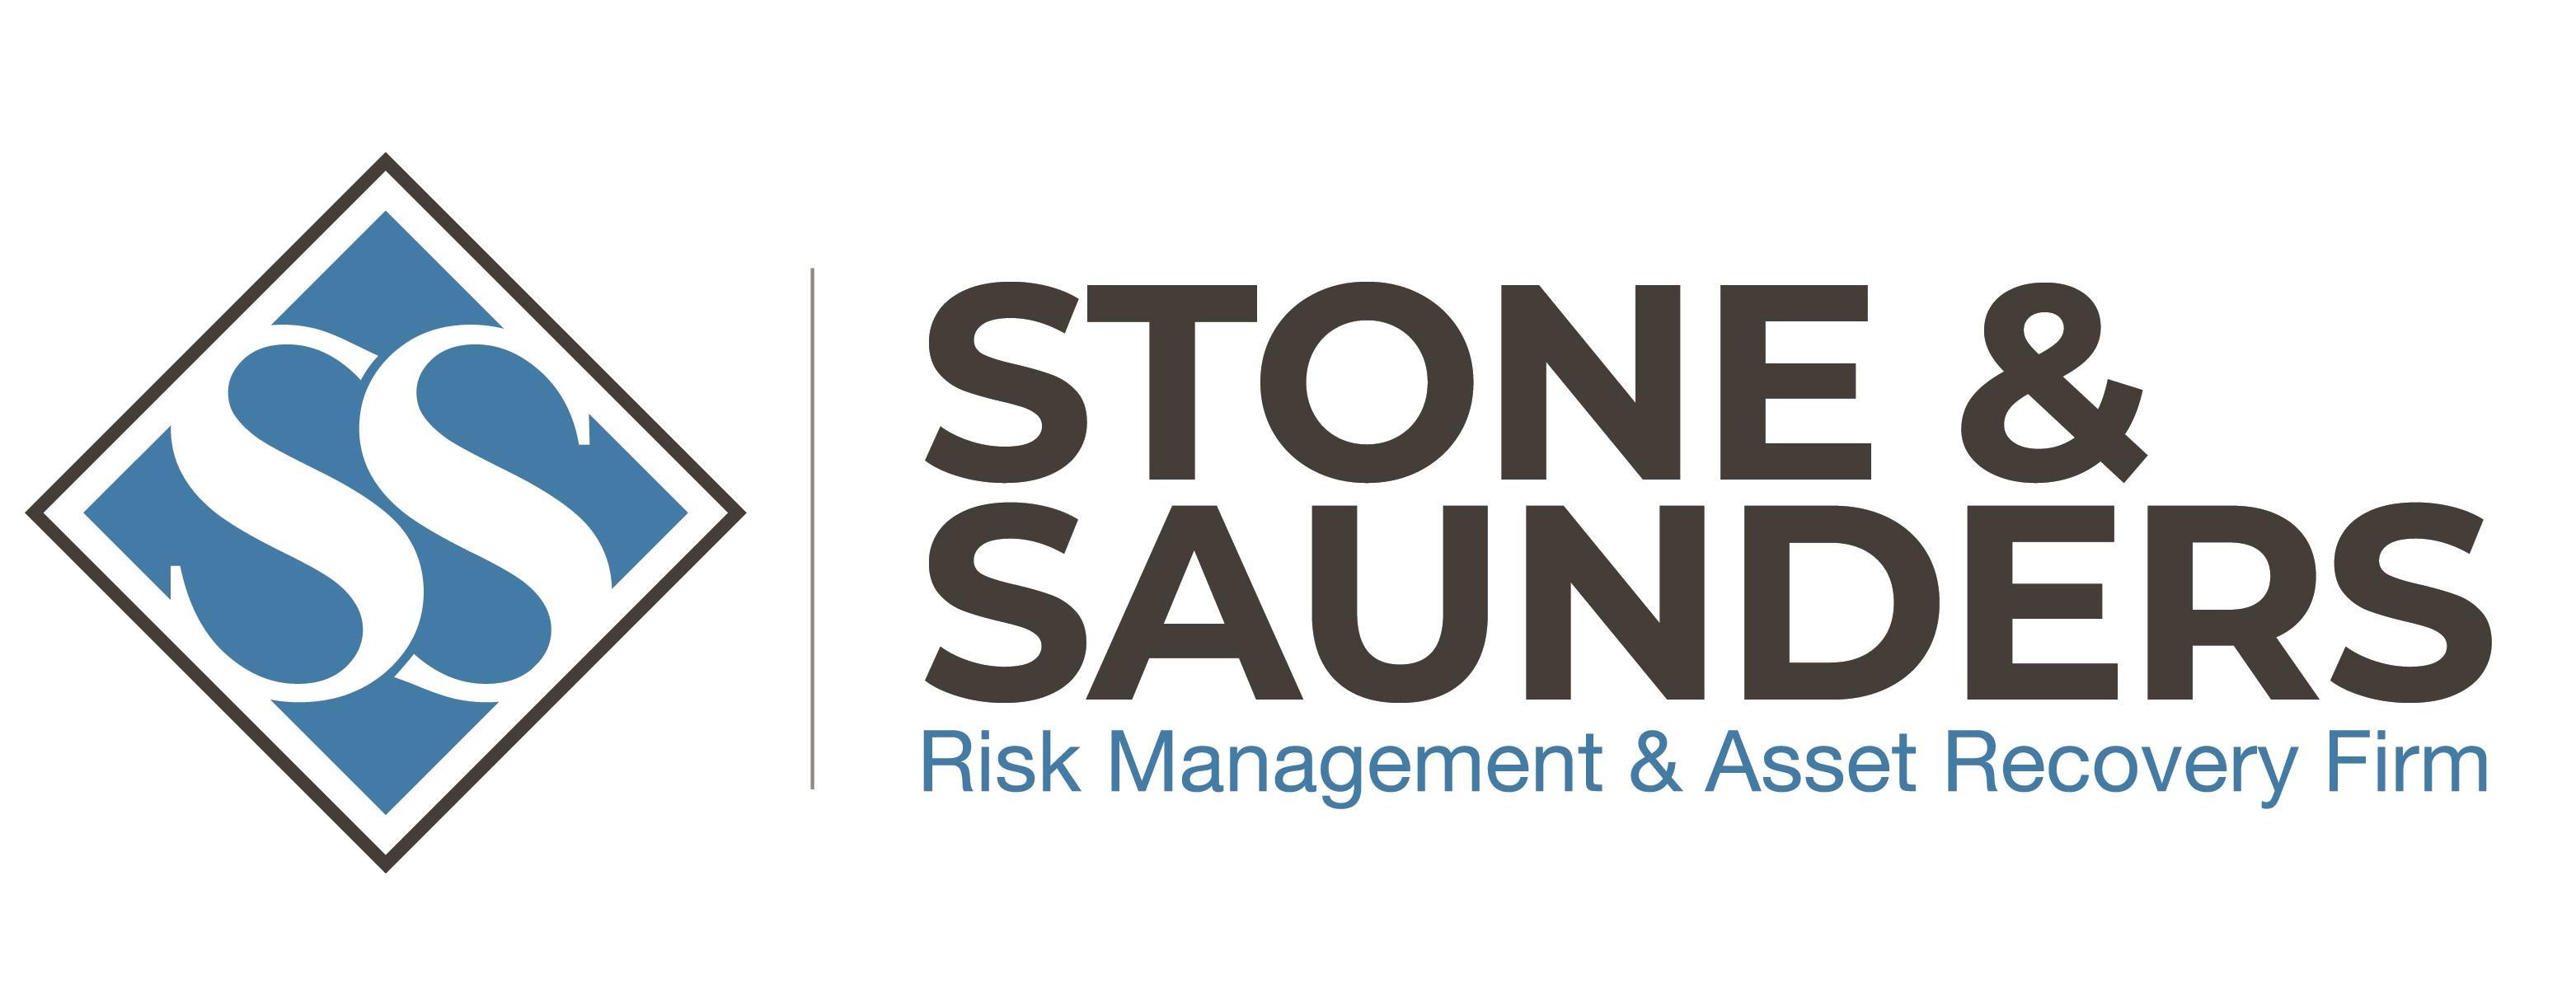 Stone & Saunders image 0